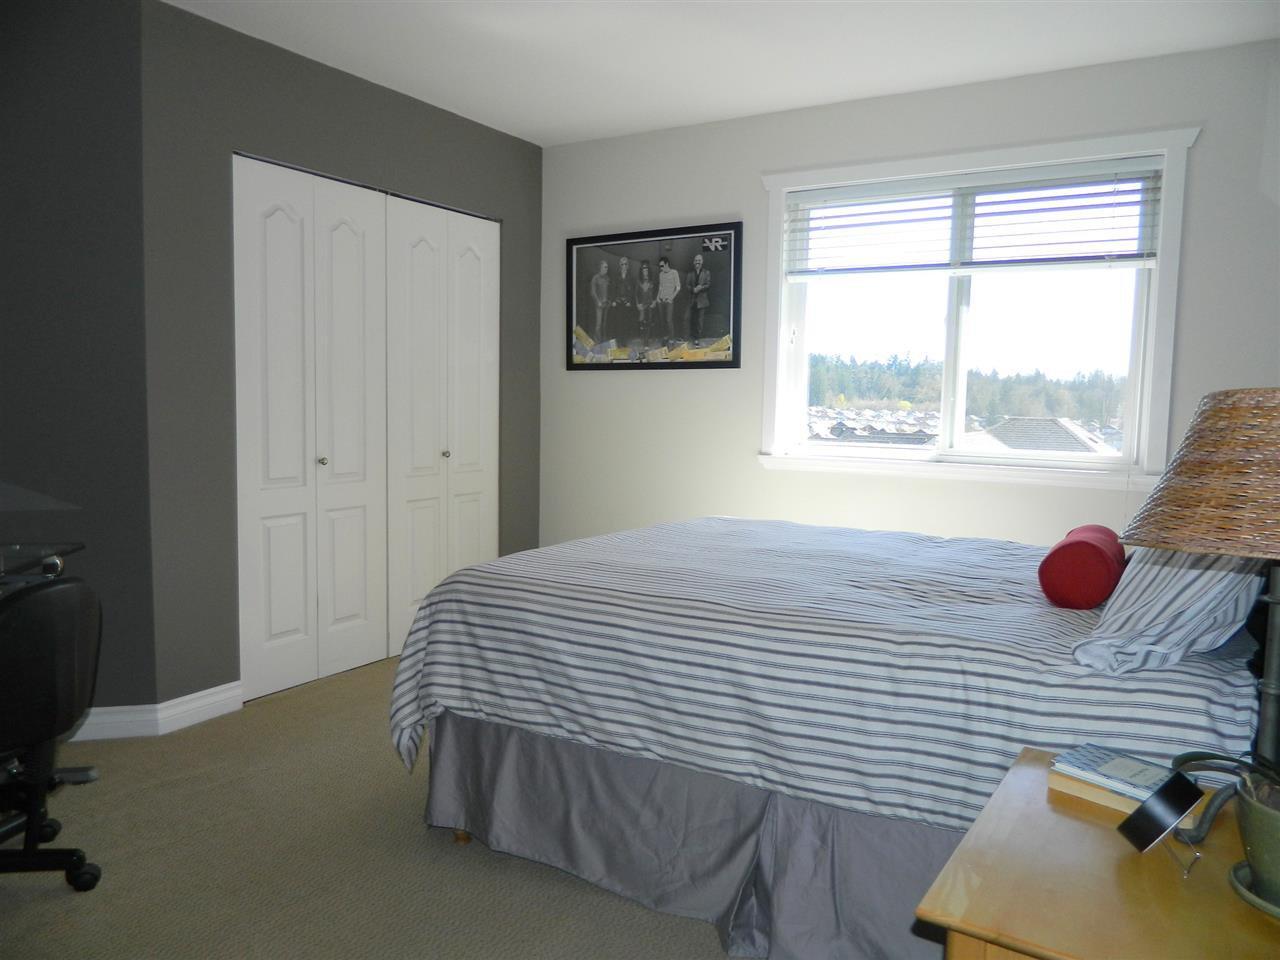 Photo 12: Photos: 24332 104 AVENUE in Maple Ridge: Albion House for sale : MLS®# R2051414